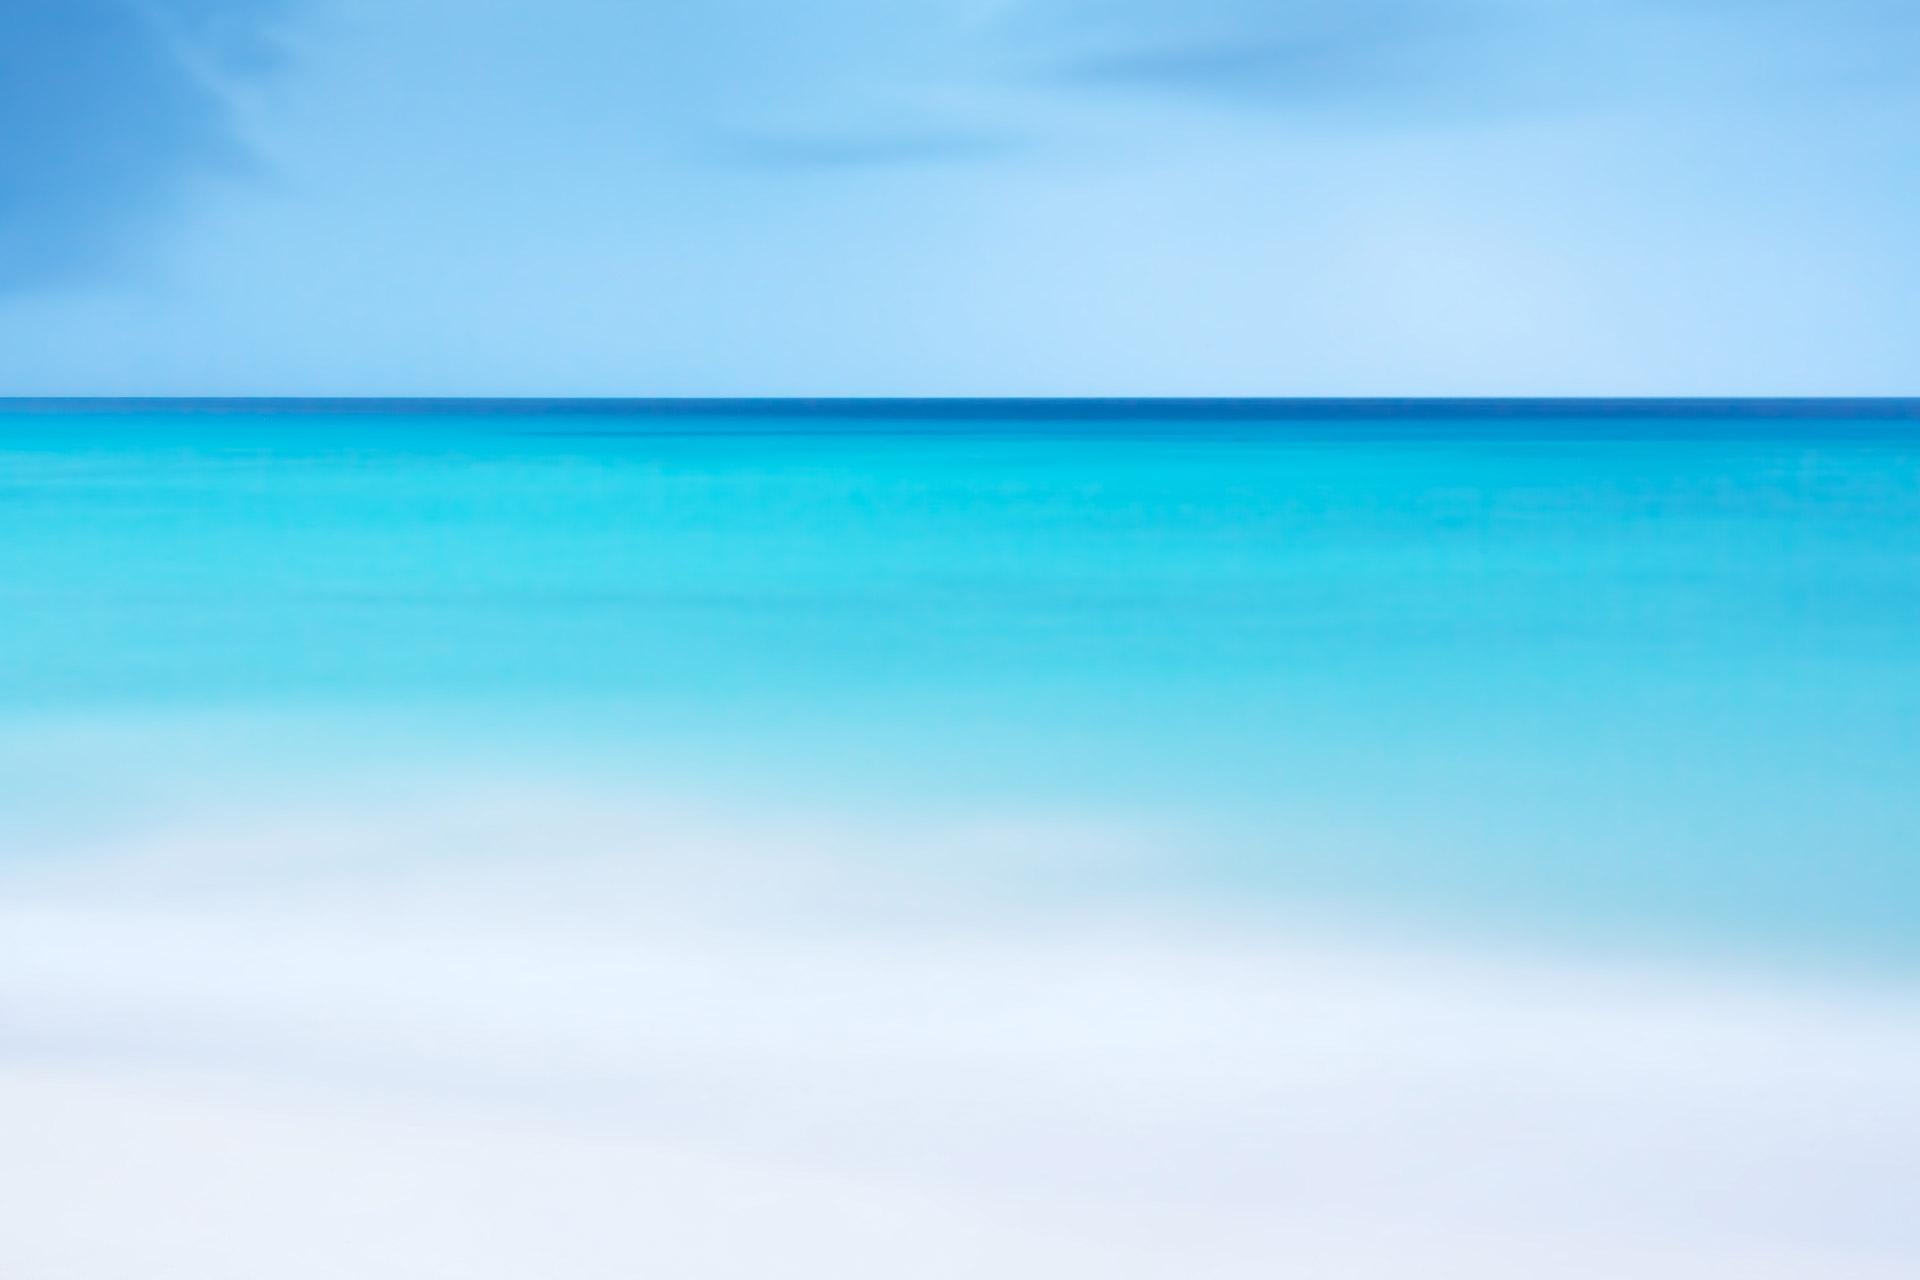 Sea-wallpaper - Sea , HD Wallpaper & Backgrounds